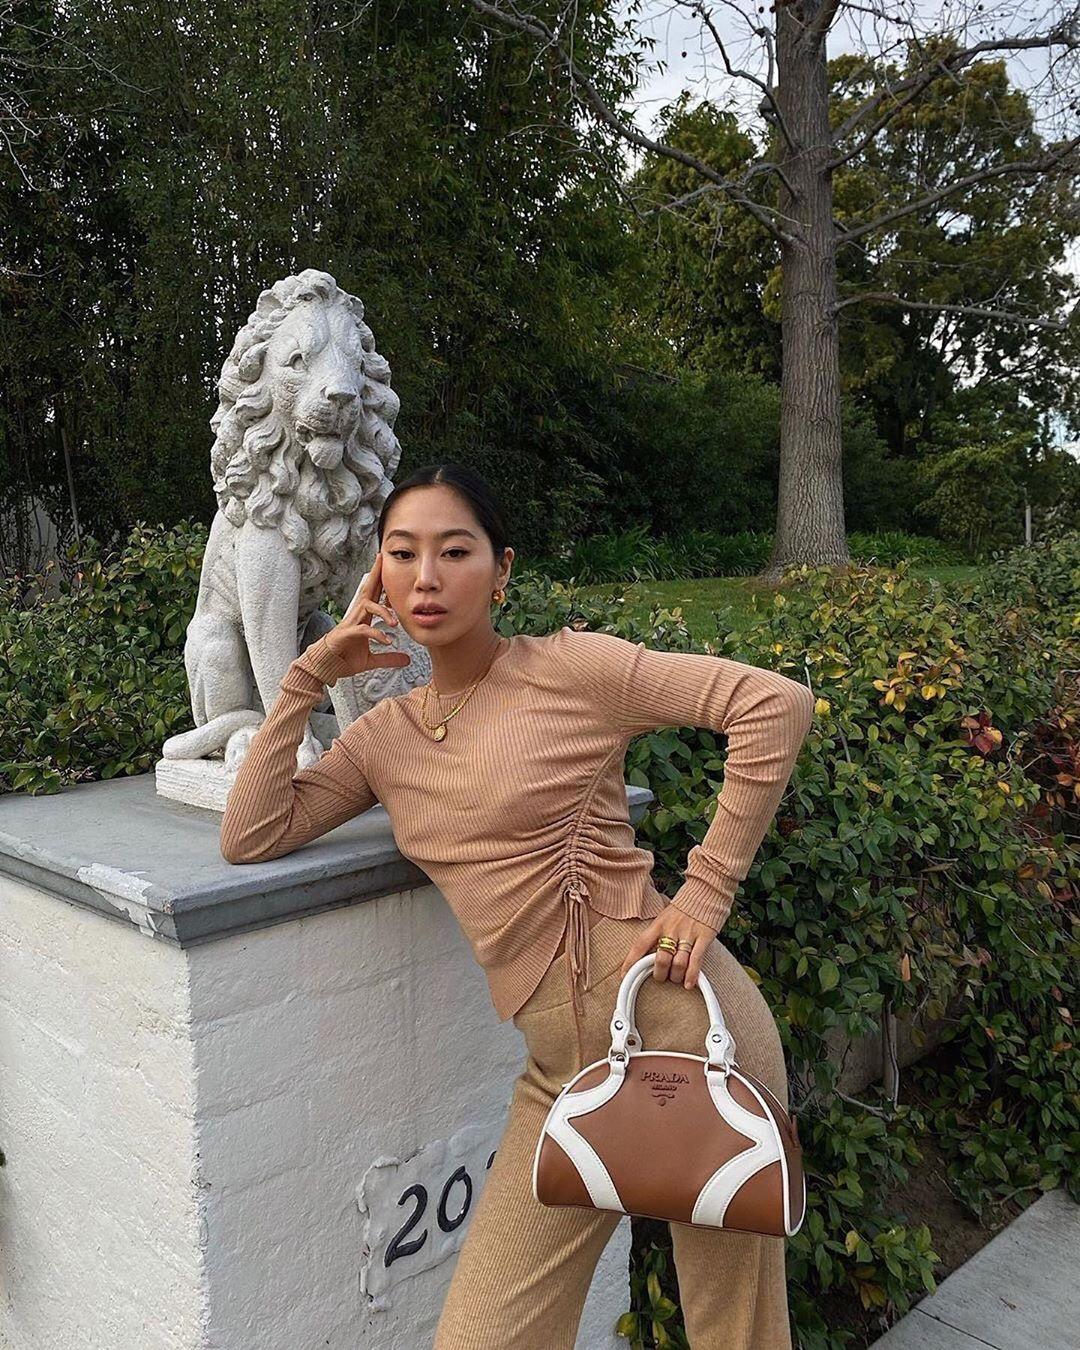 Aimee Song wearing Comfortable metallic light gold high rise pants